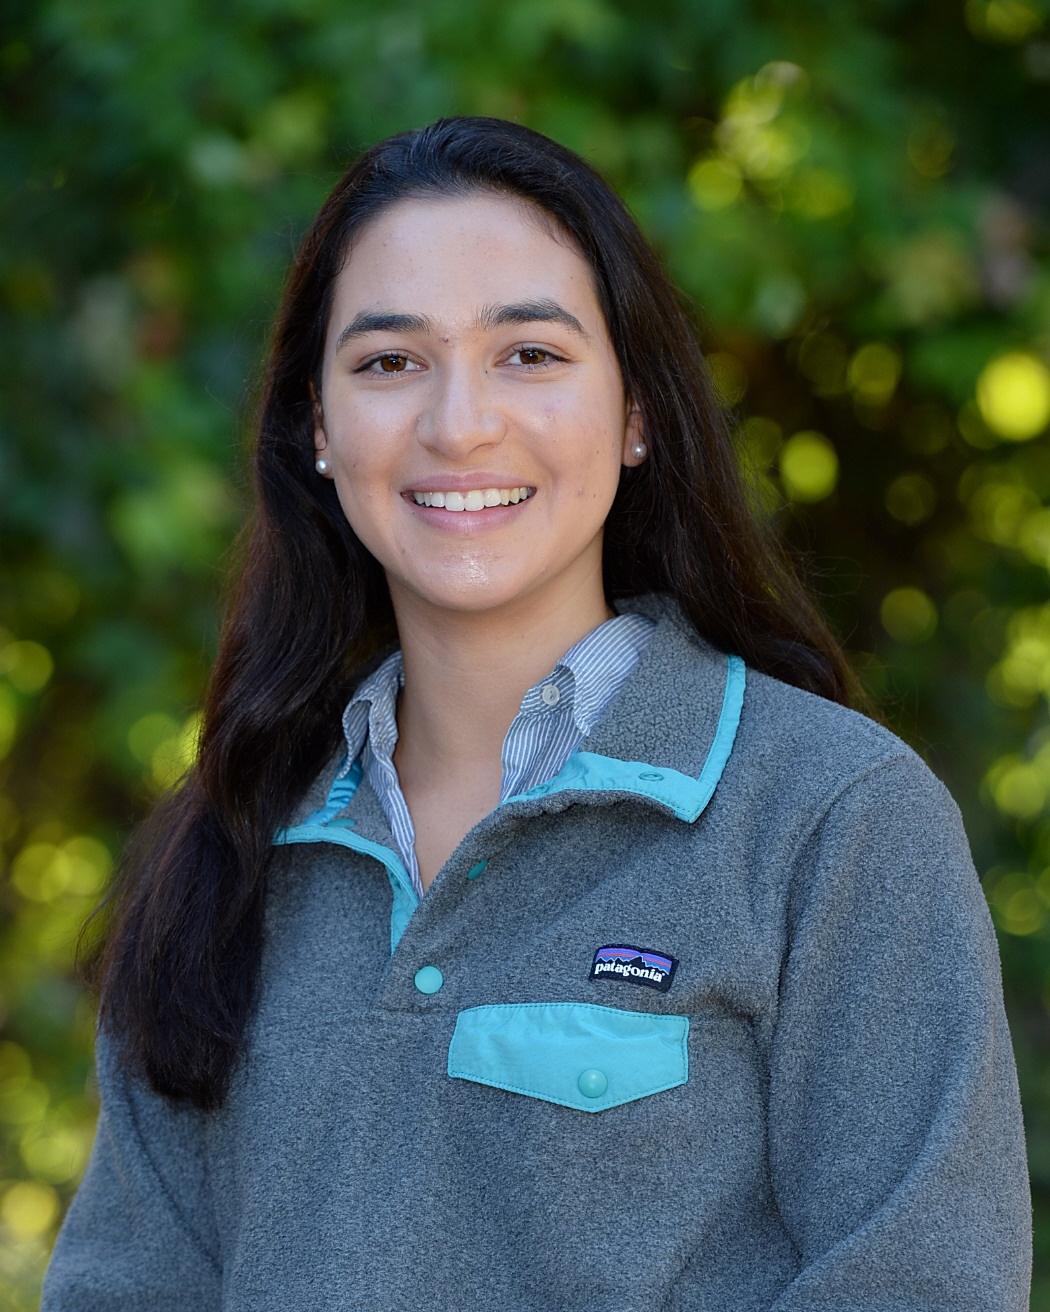 Georgia Rosenberg '19: Student